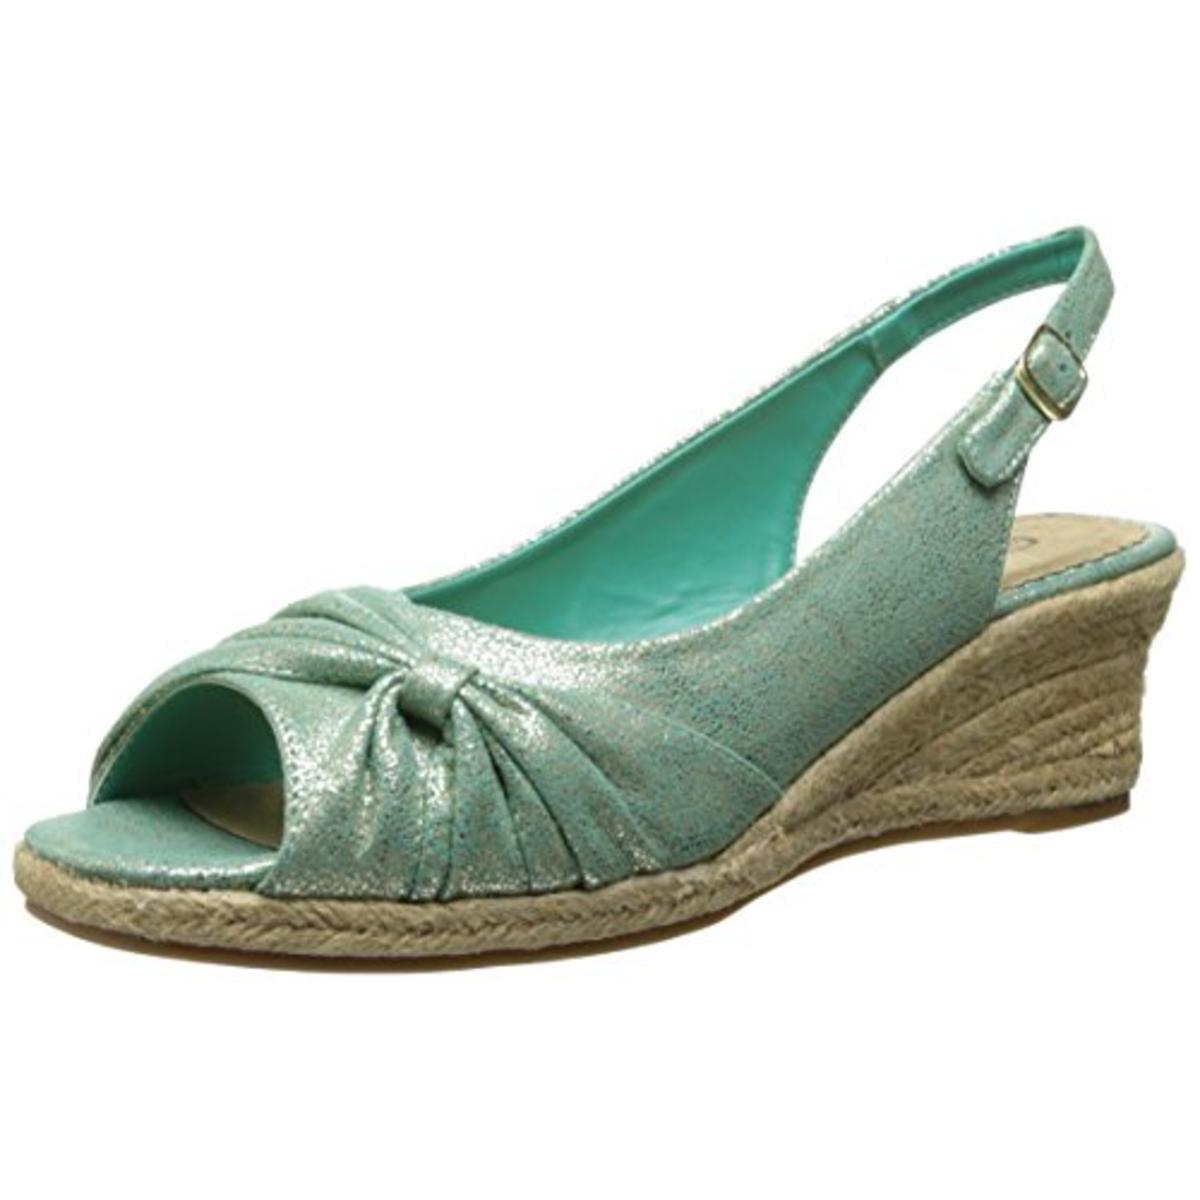 Bella Vita Womens Sangria Too Metallic Espadrille Wedge Sandals by Bella Vita